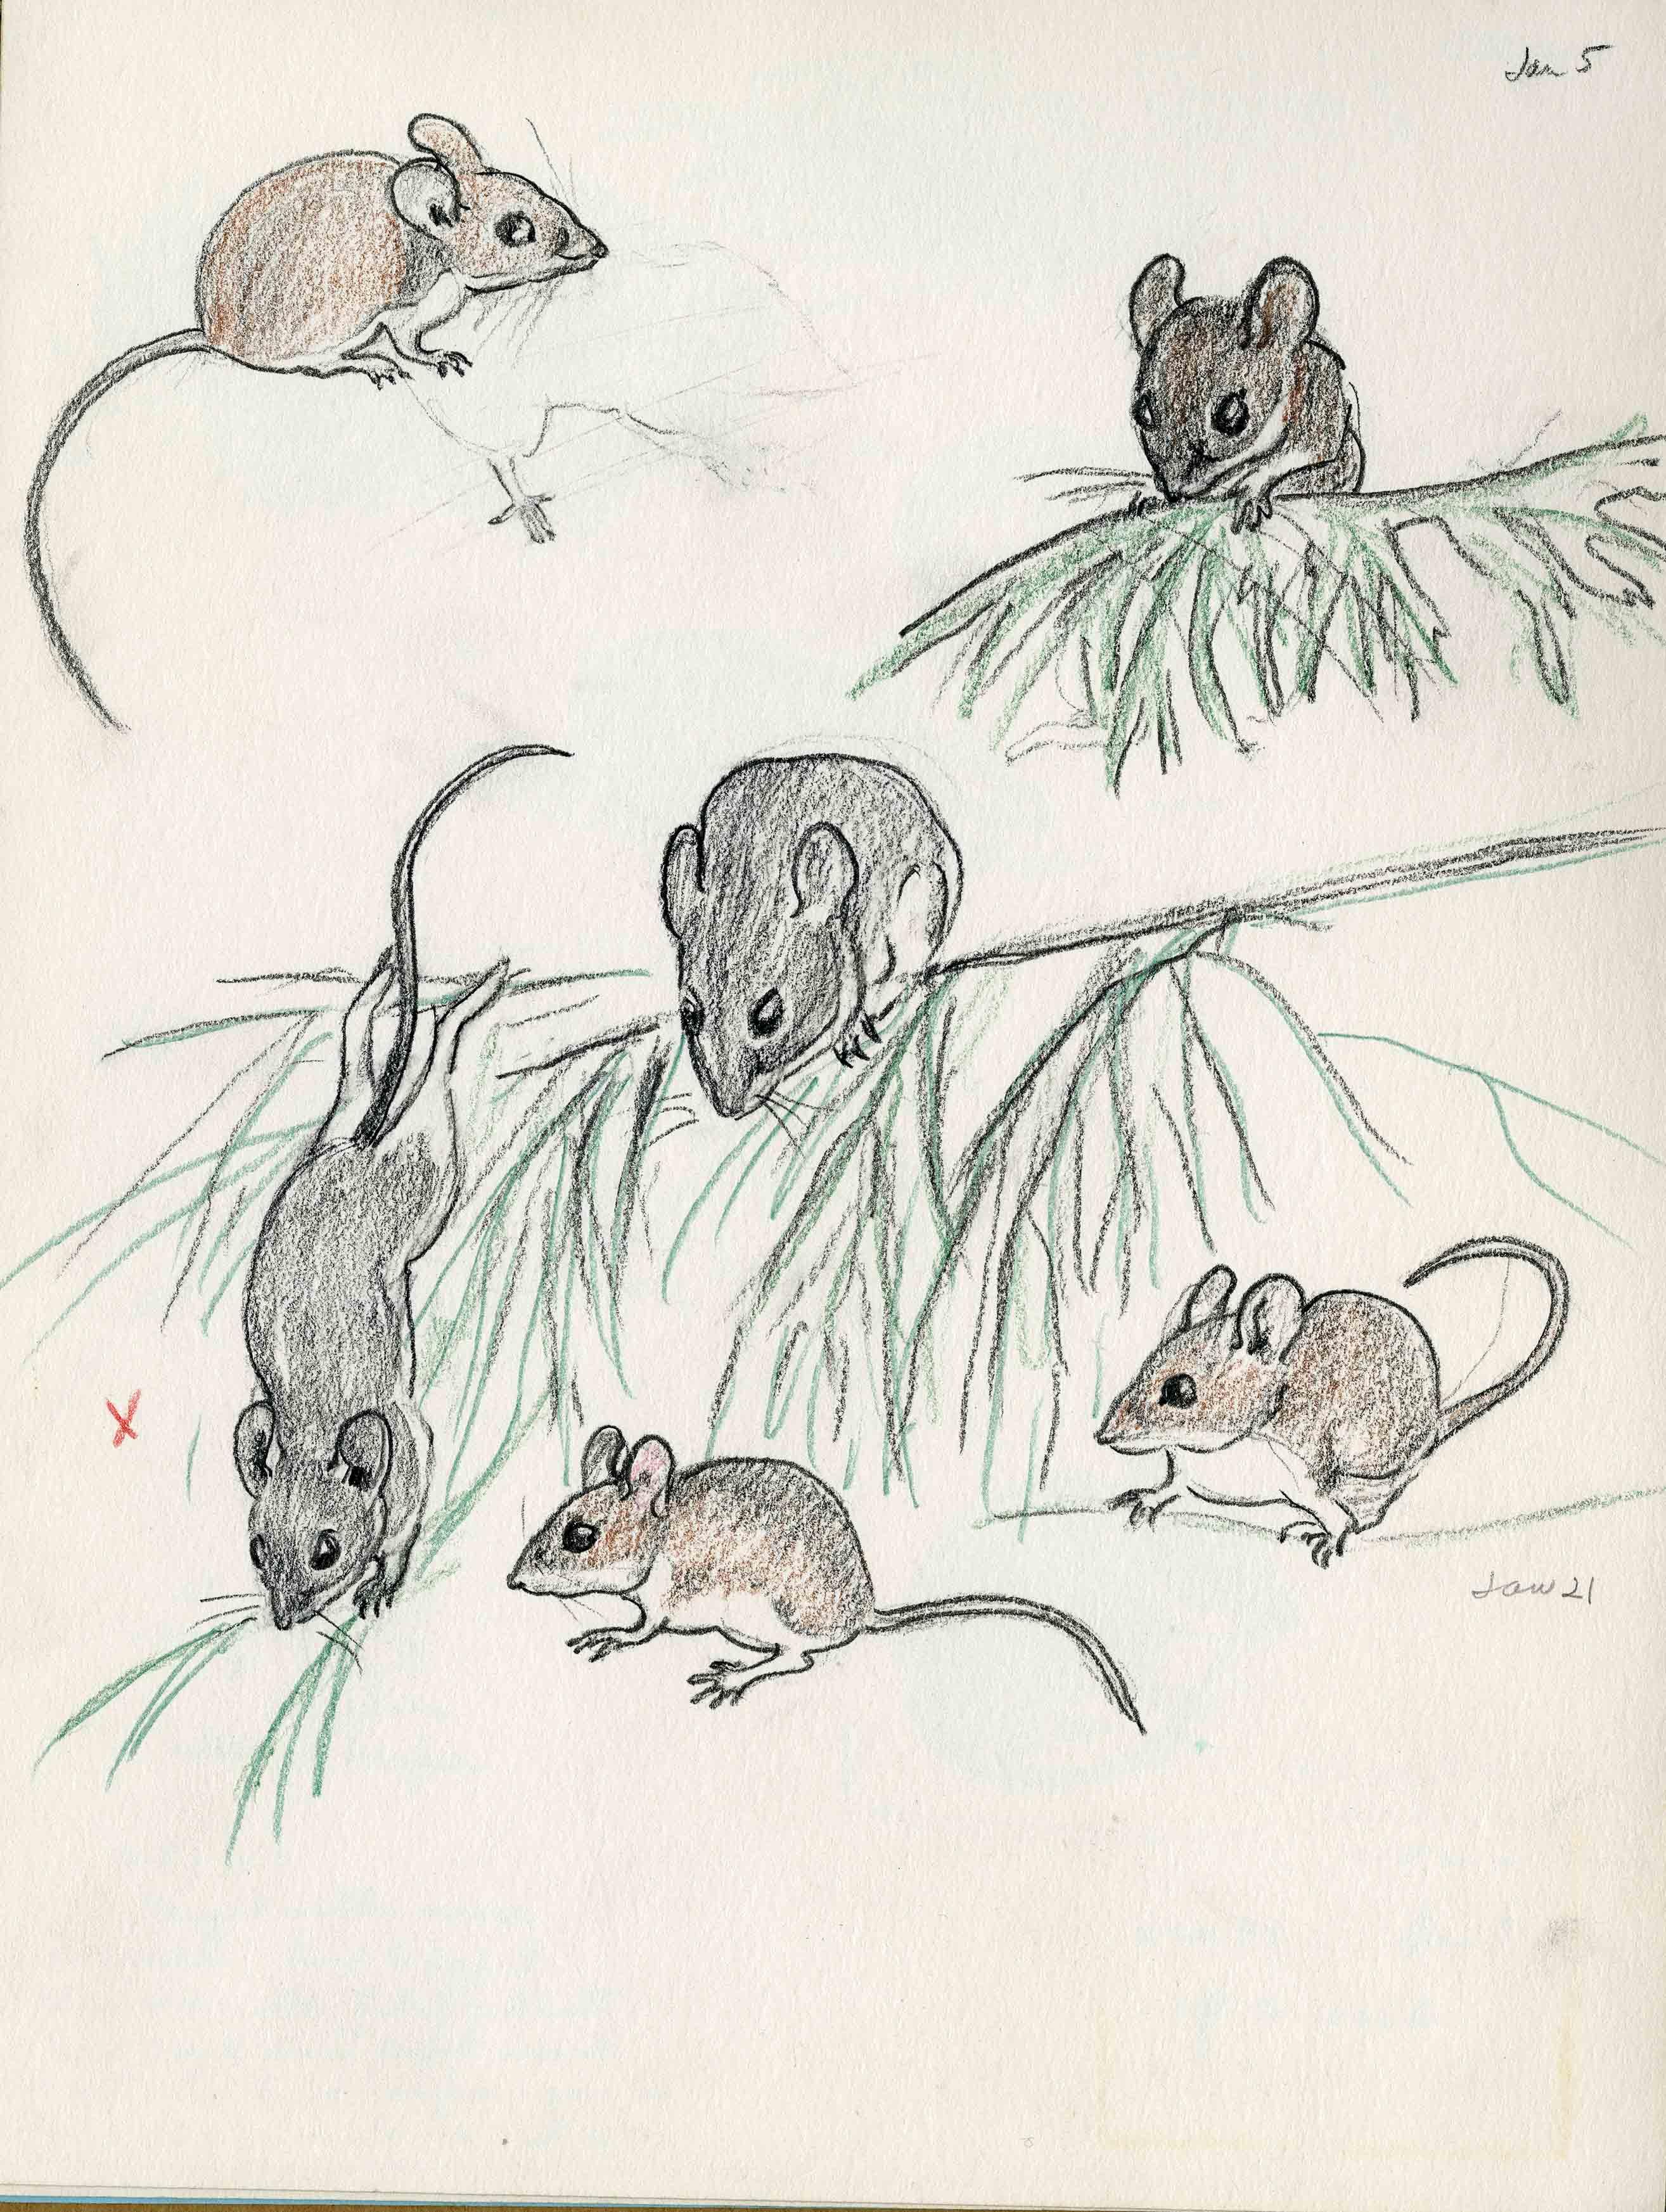 Sketch by Margaret Waring Buck